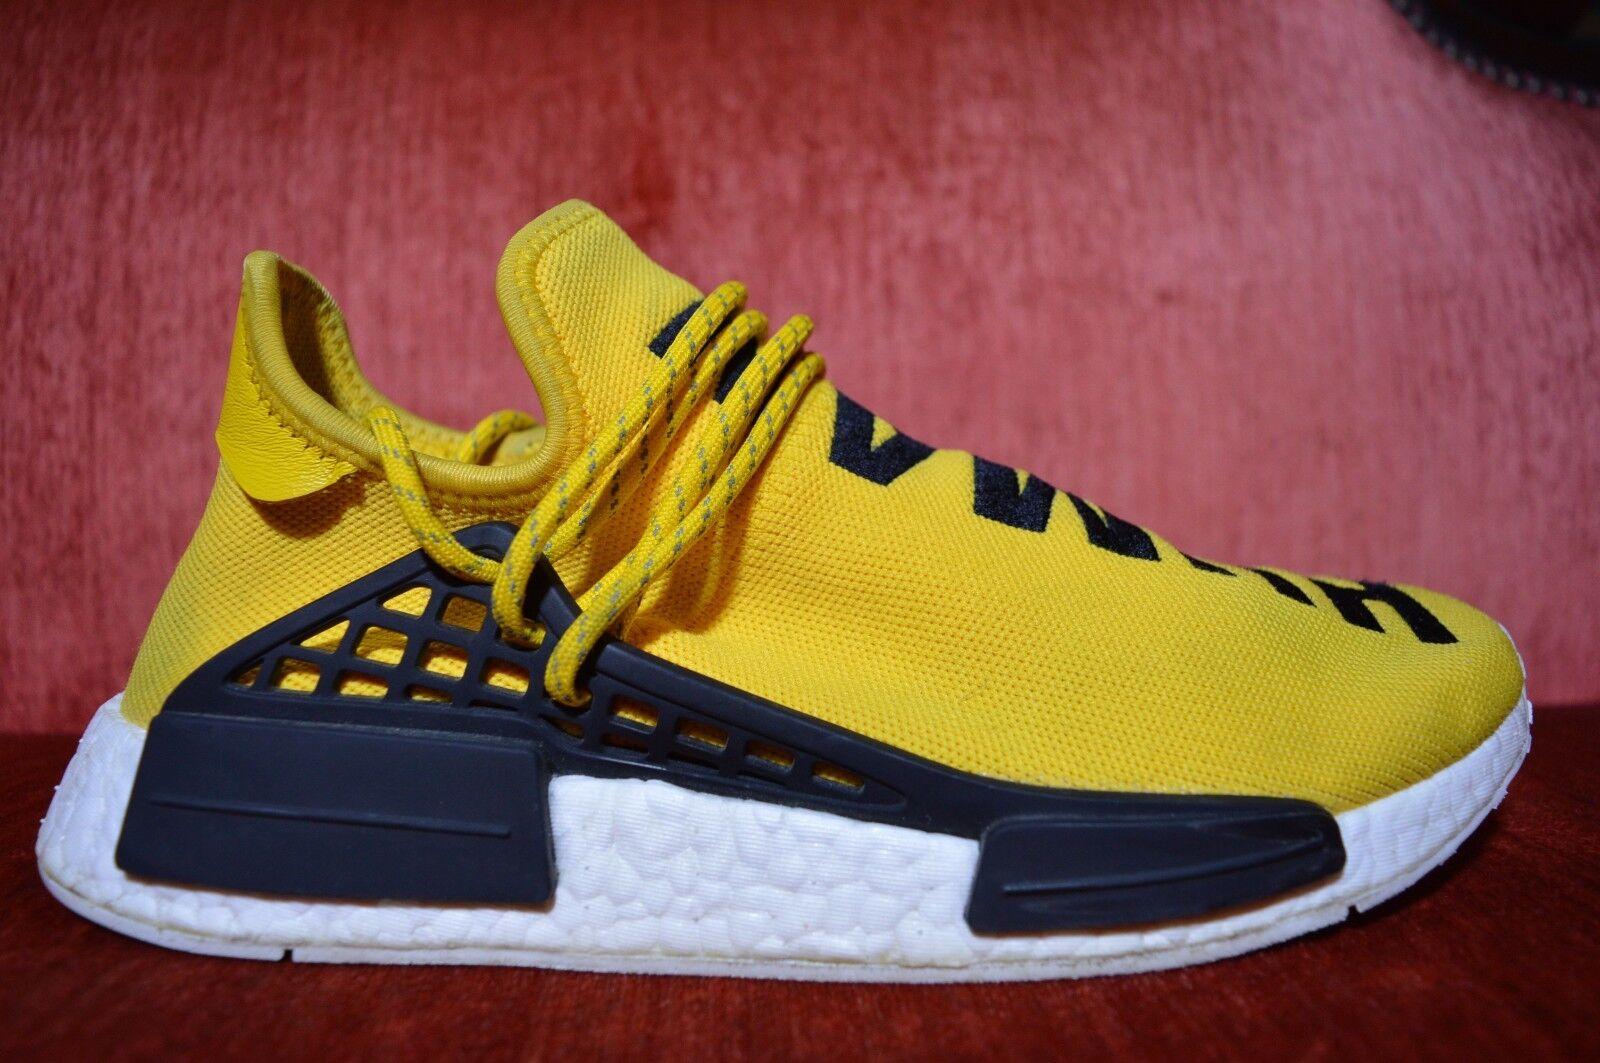 USED Adidas NMD HU Pharrell Williams Human Race Yellow BB0619 size 9